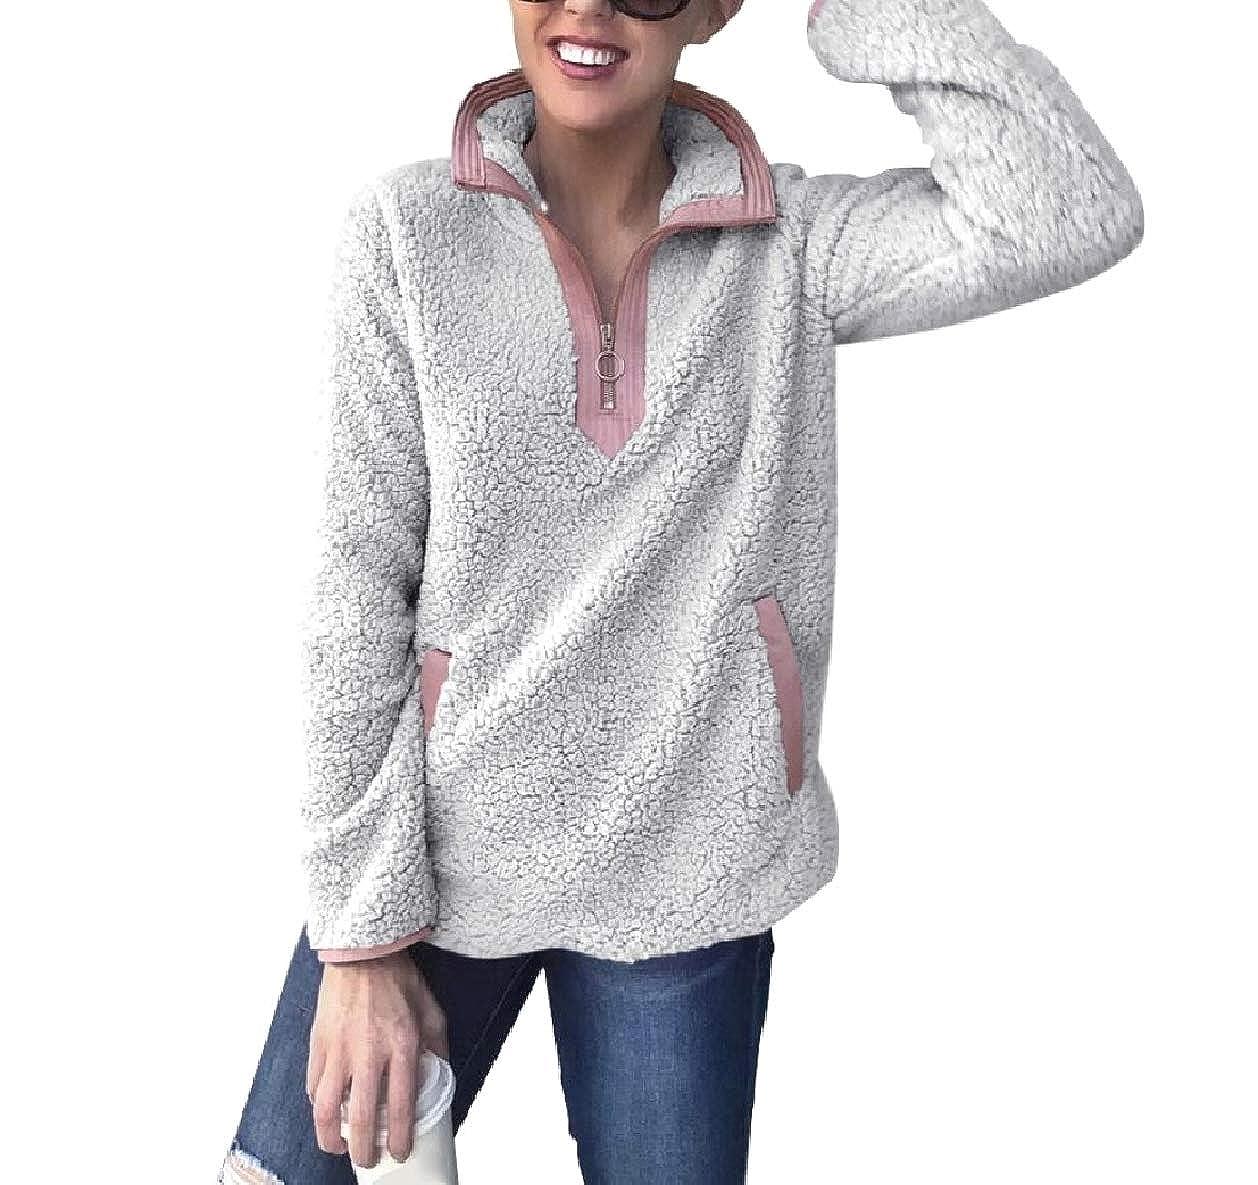 Tootless-Women Fashionable Stitch Kanga Pocket Workout Loose Sweatshirts